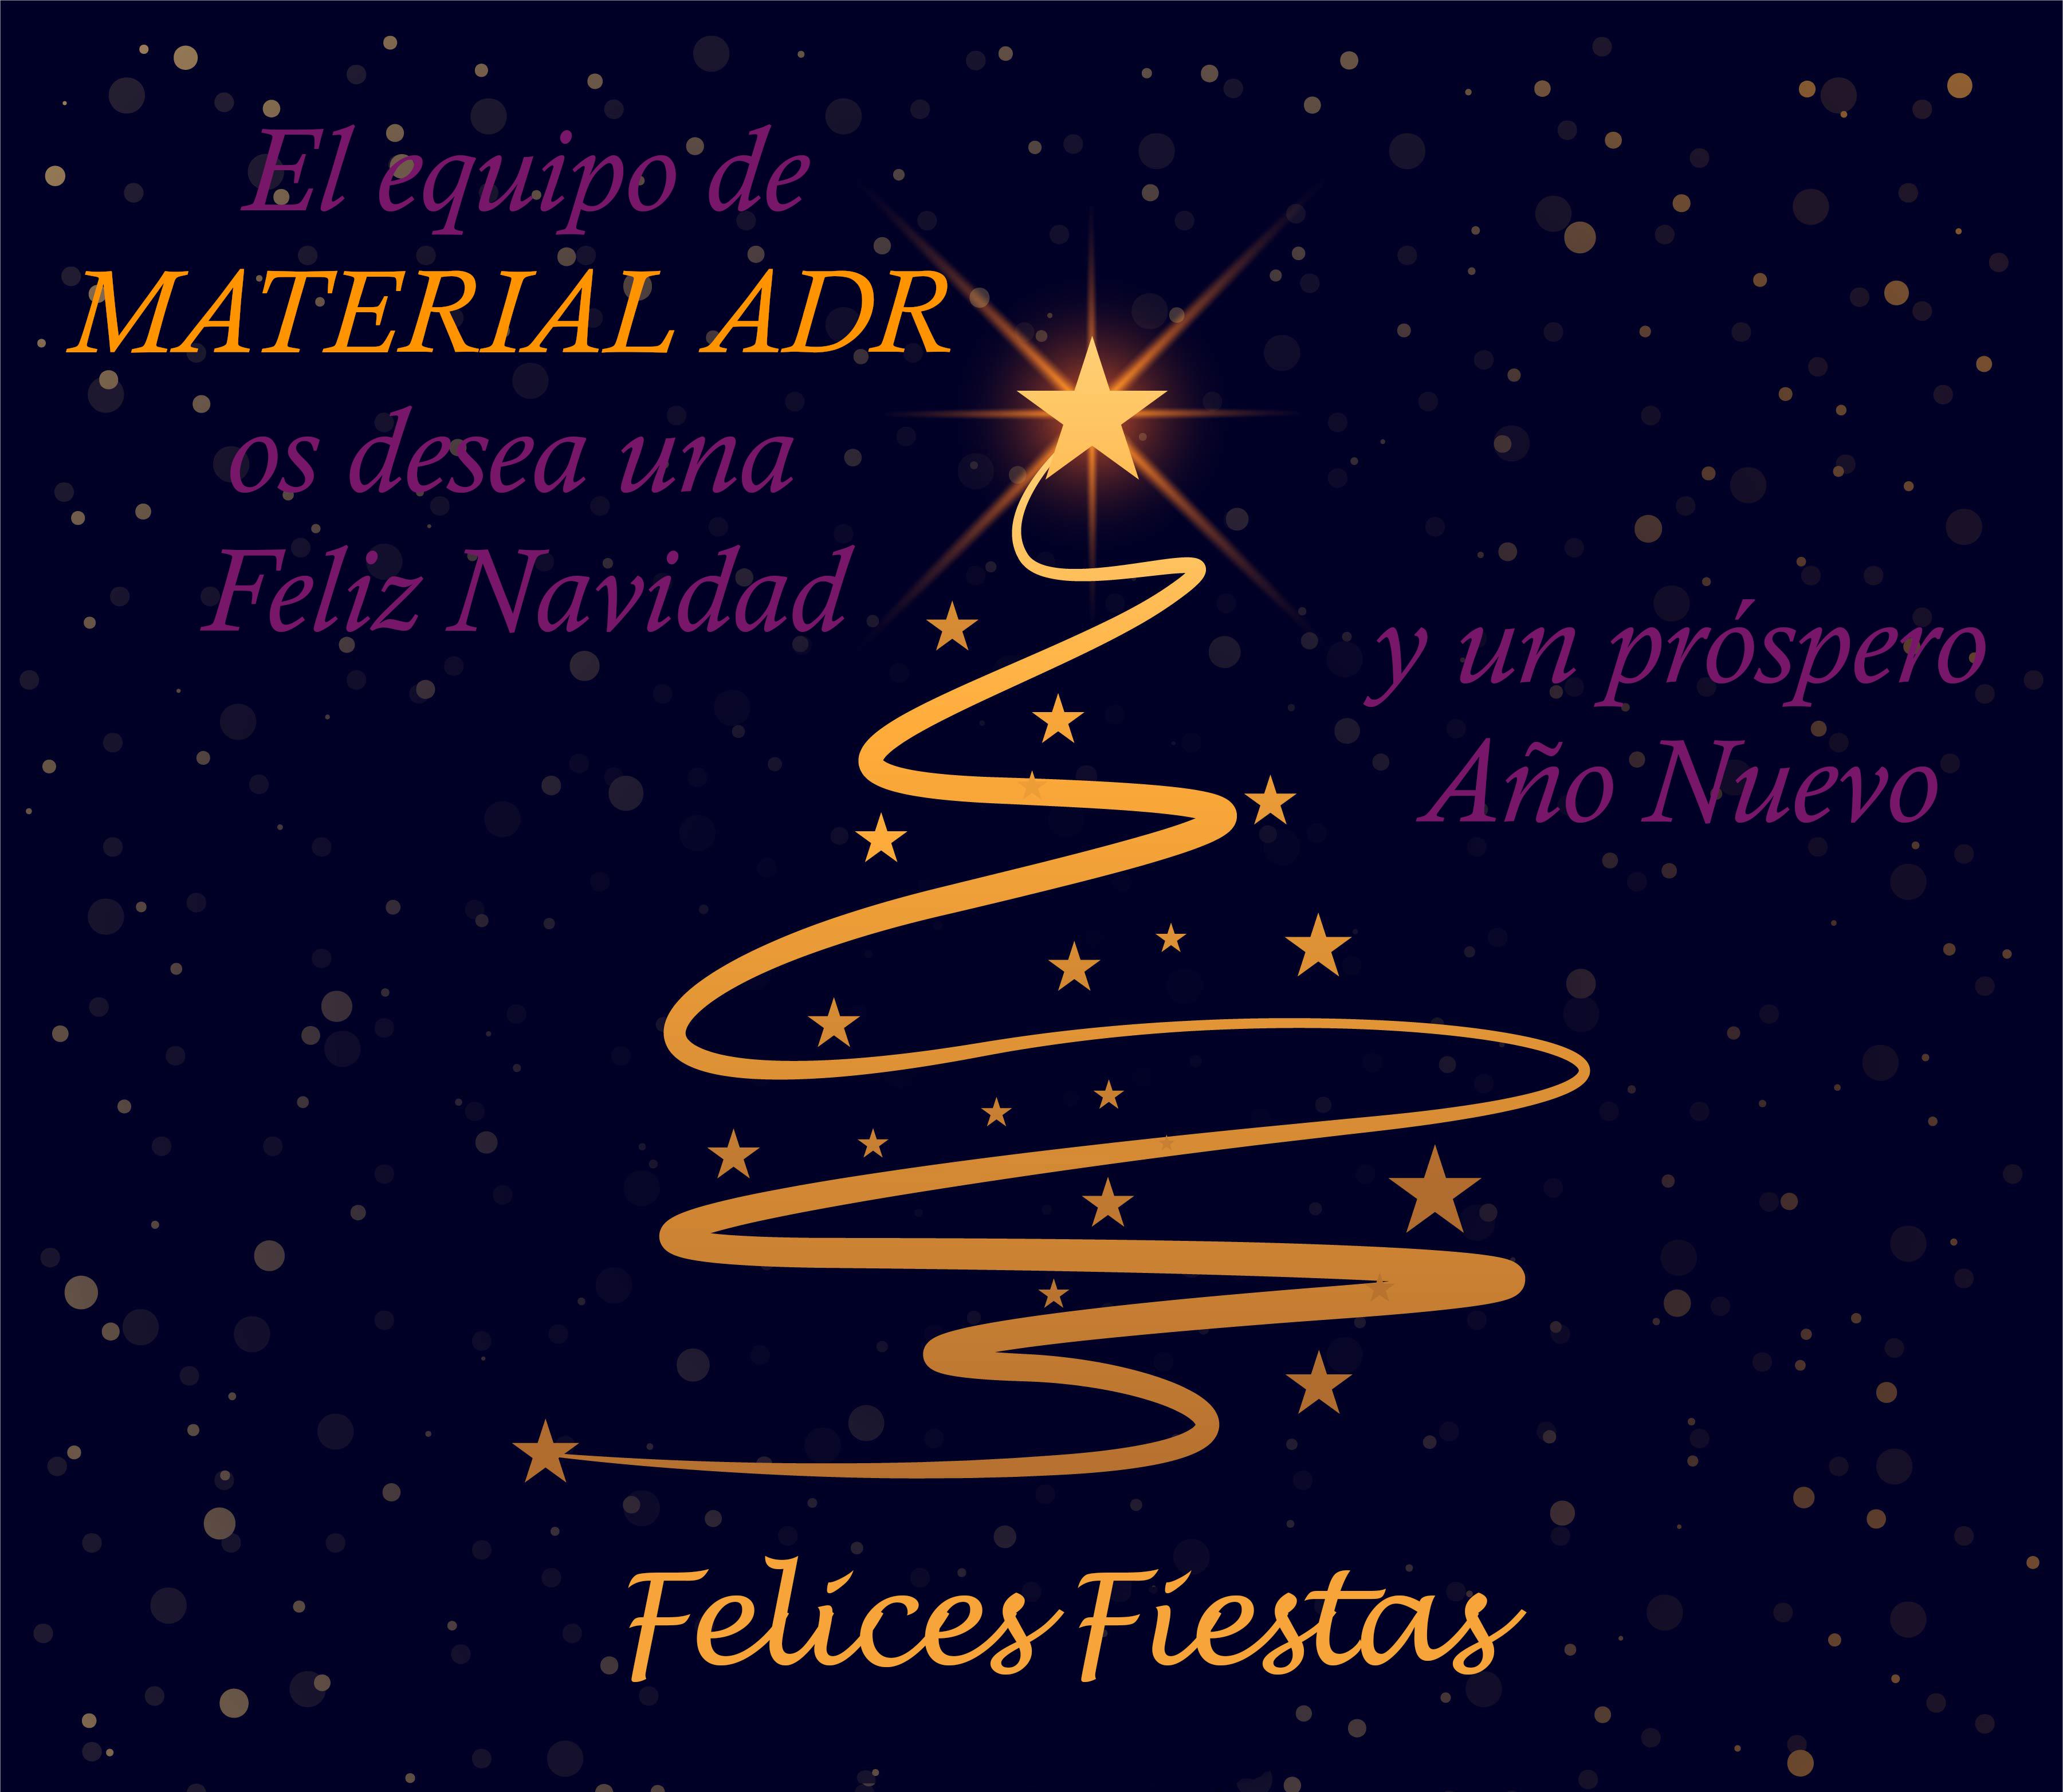 ¡Felices Fiestas! – Material ADR